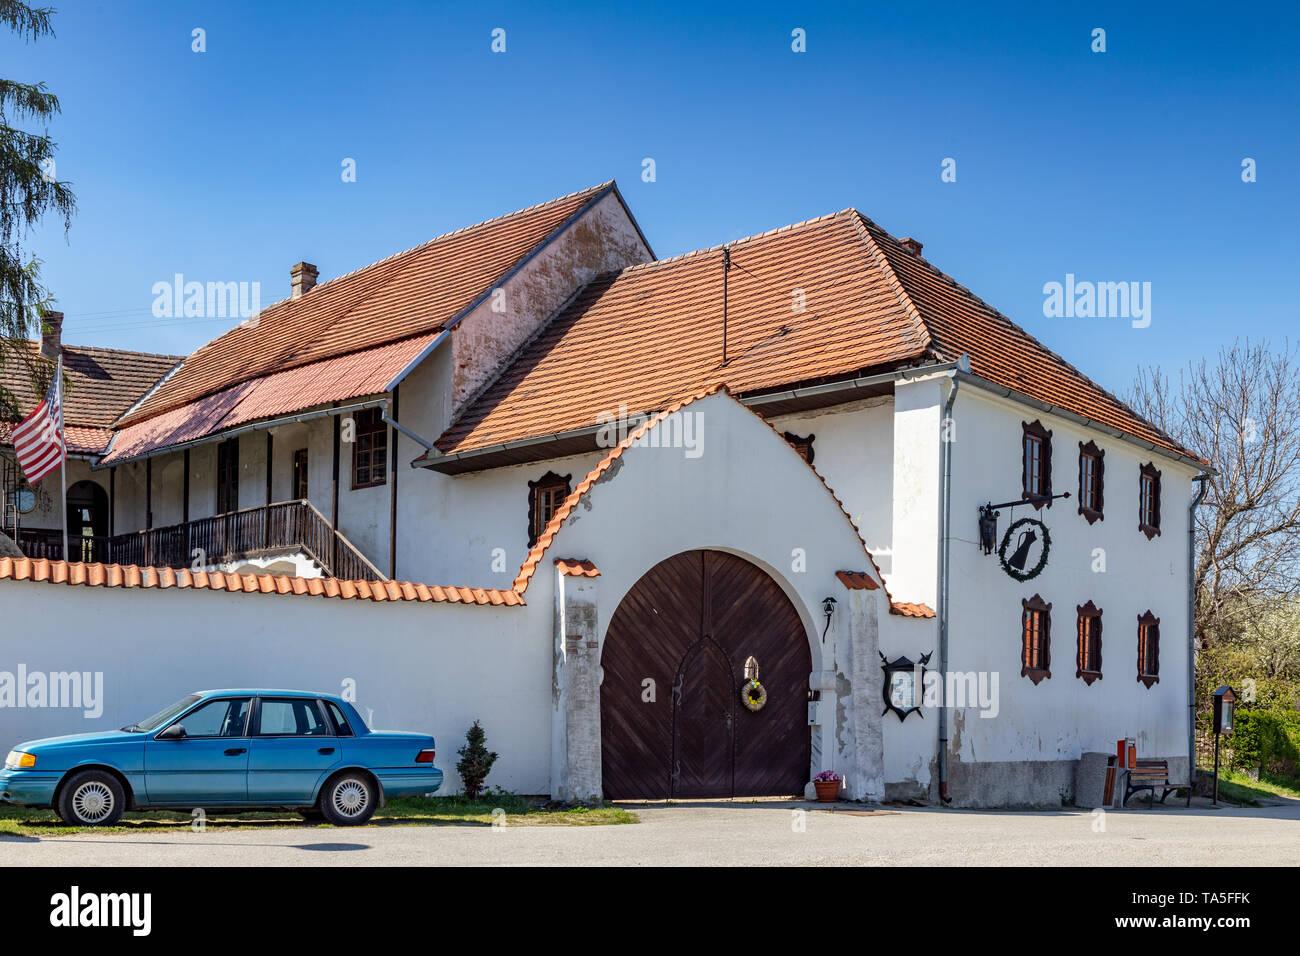 tvrz, vesnice Dobšice u Holašovic, Jizni Cechy, Ceska republika / manor, Dobsice village near Holasovice, South Bohemia, Czech republic - Stock Image